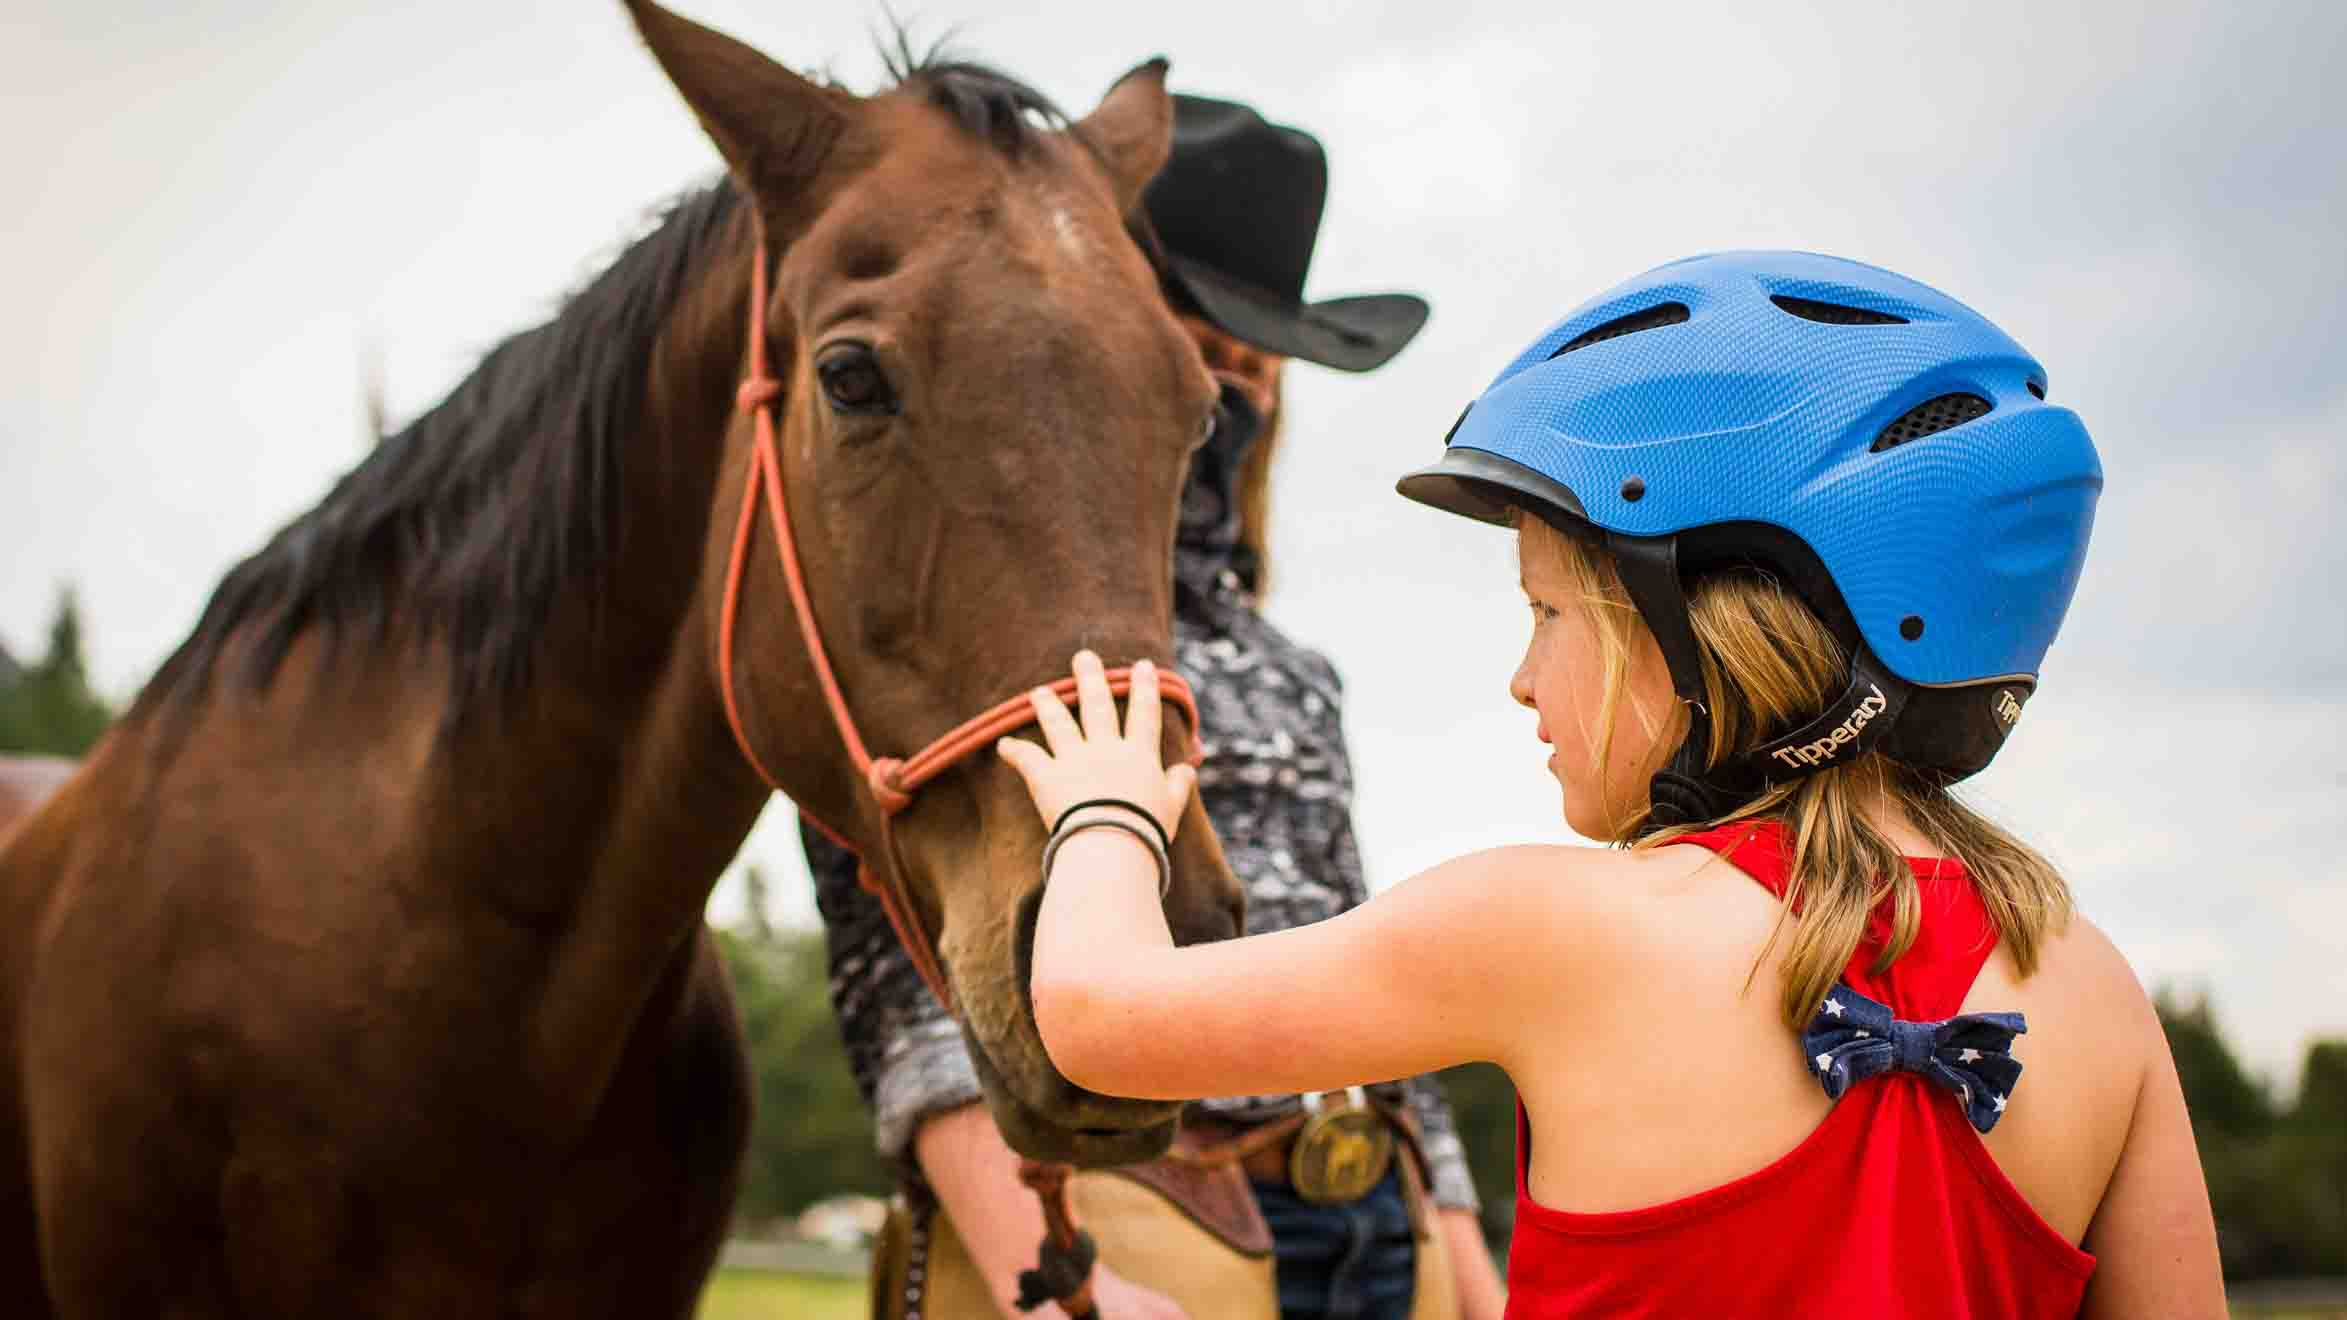 Little girl petting horse